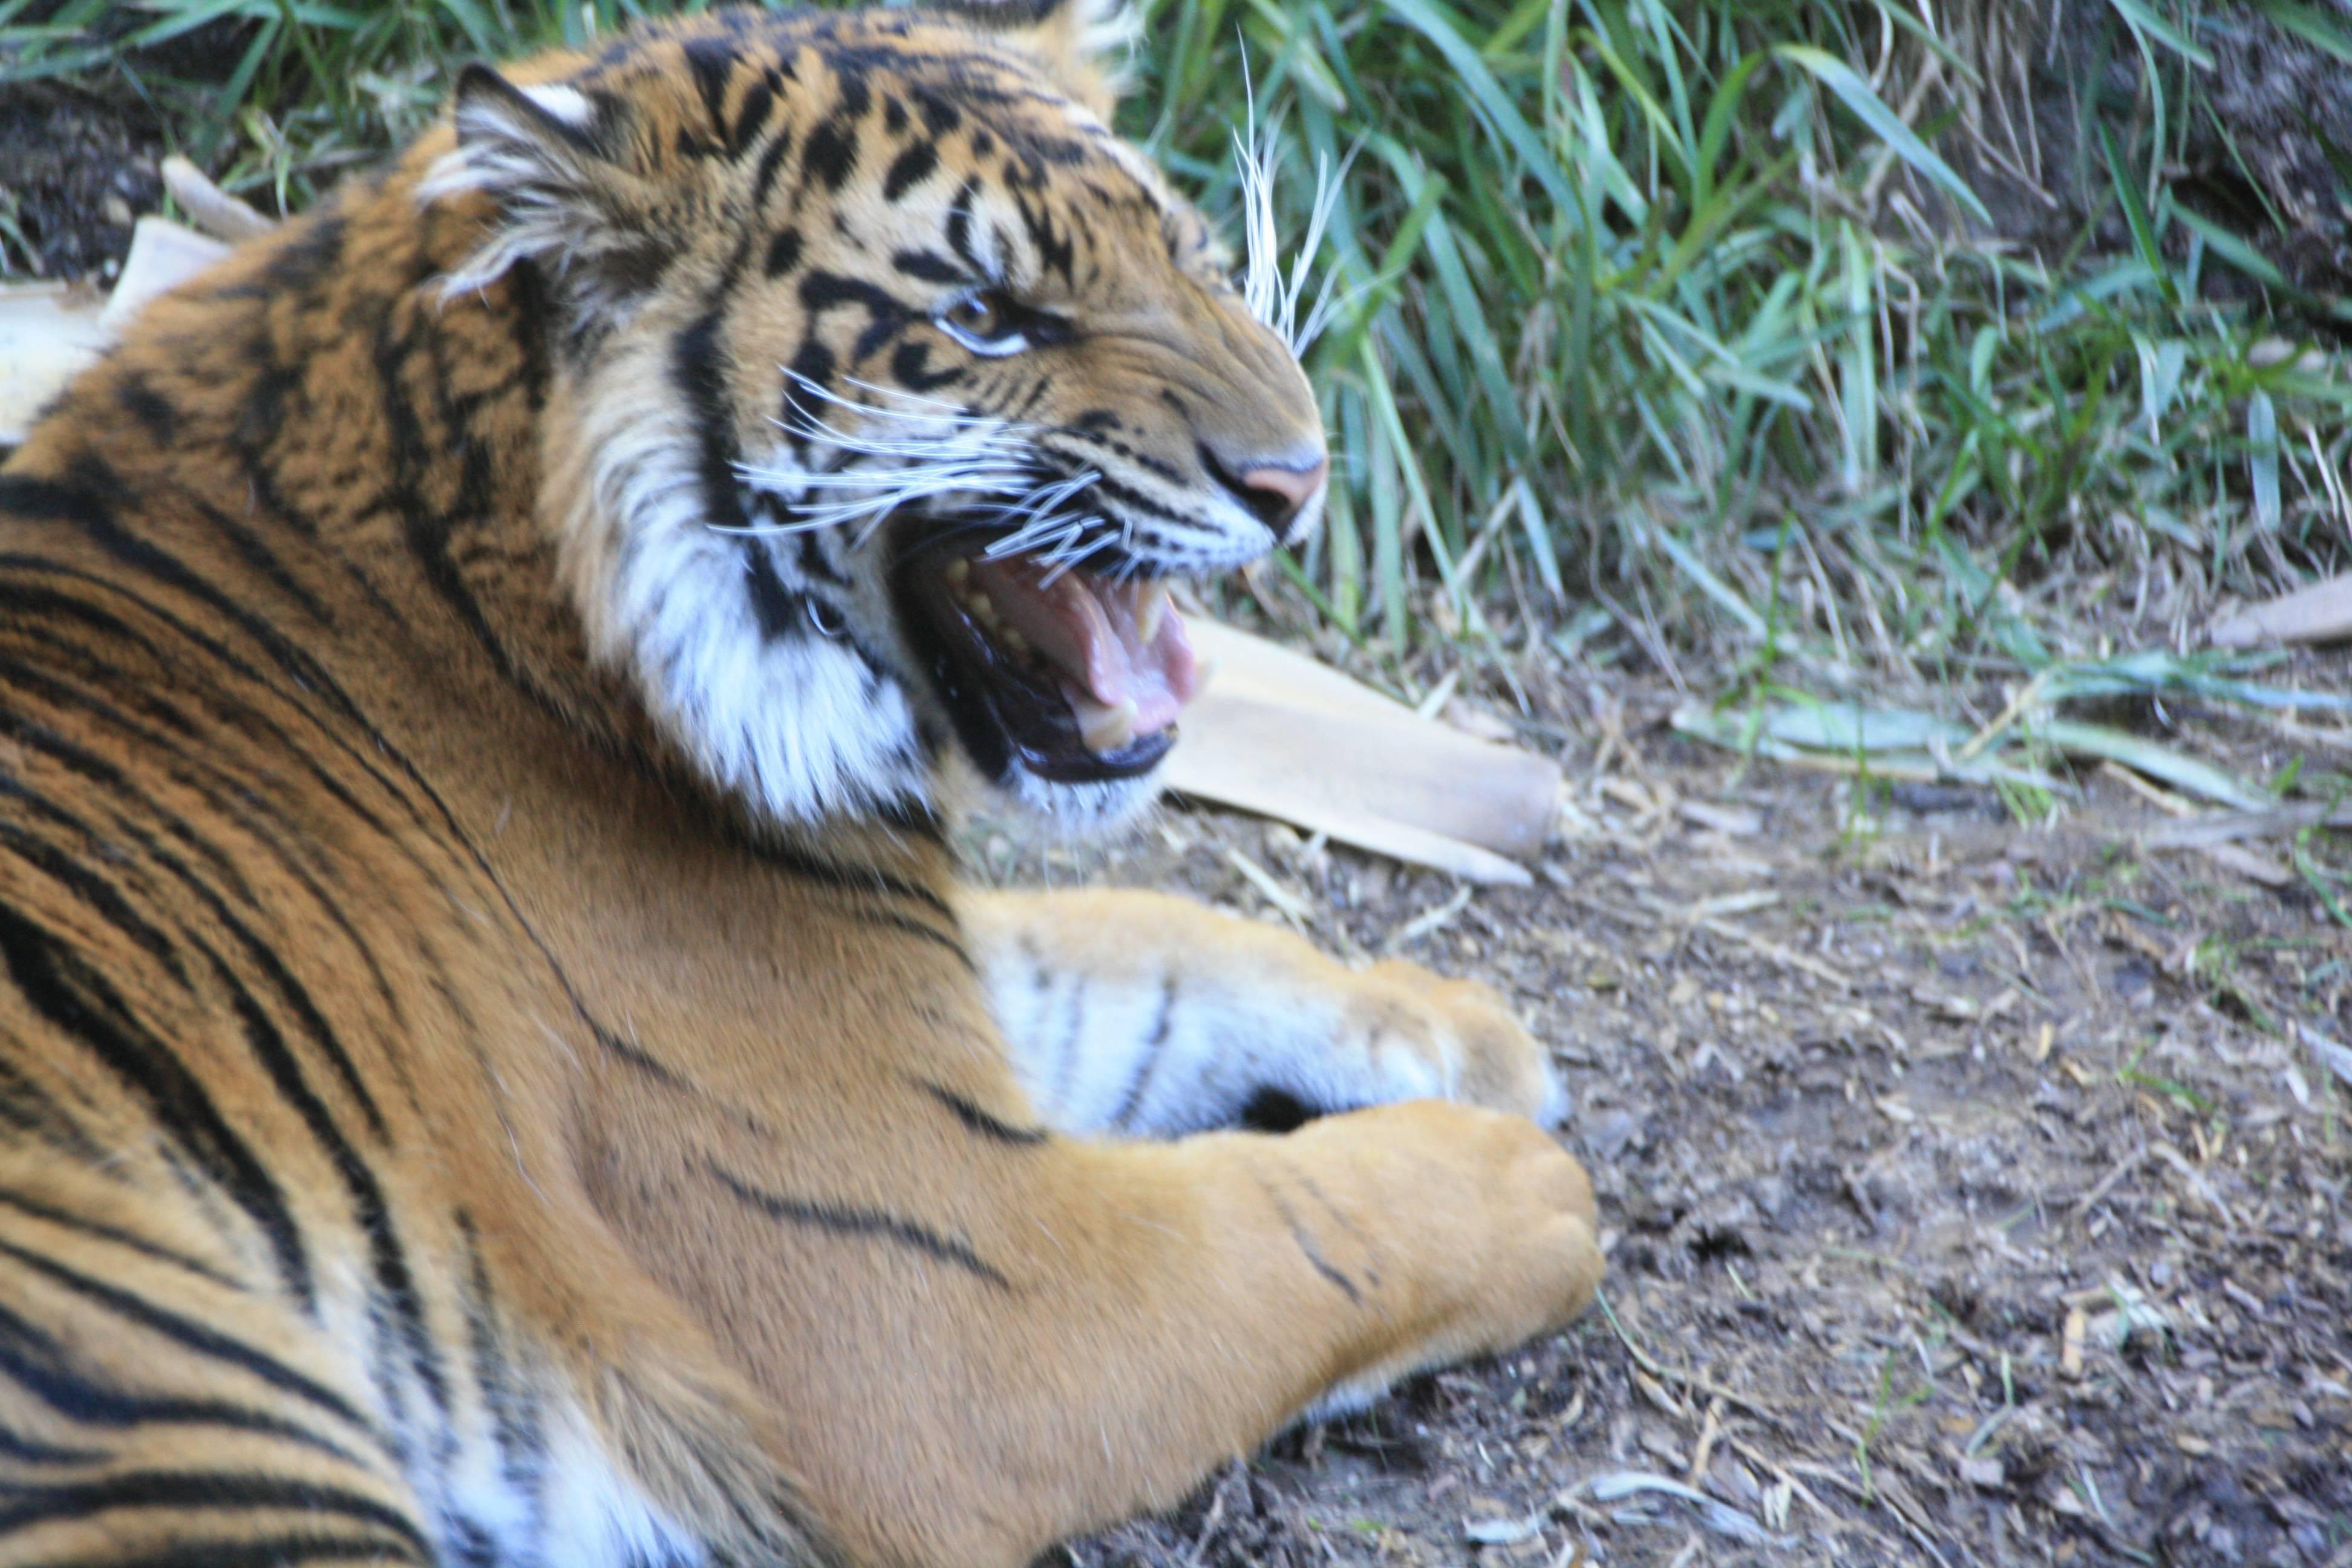 Tiger at San Diego Safari Park in Escondido CA